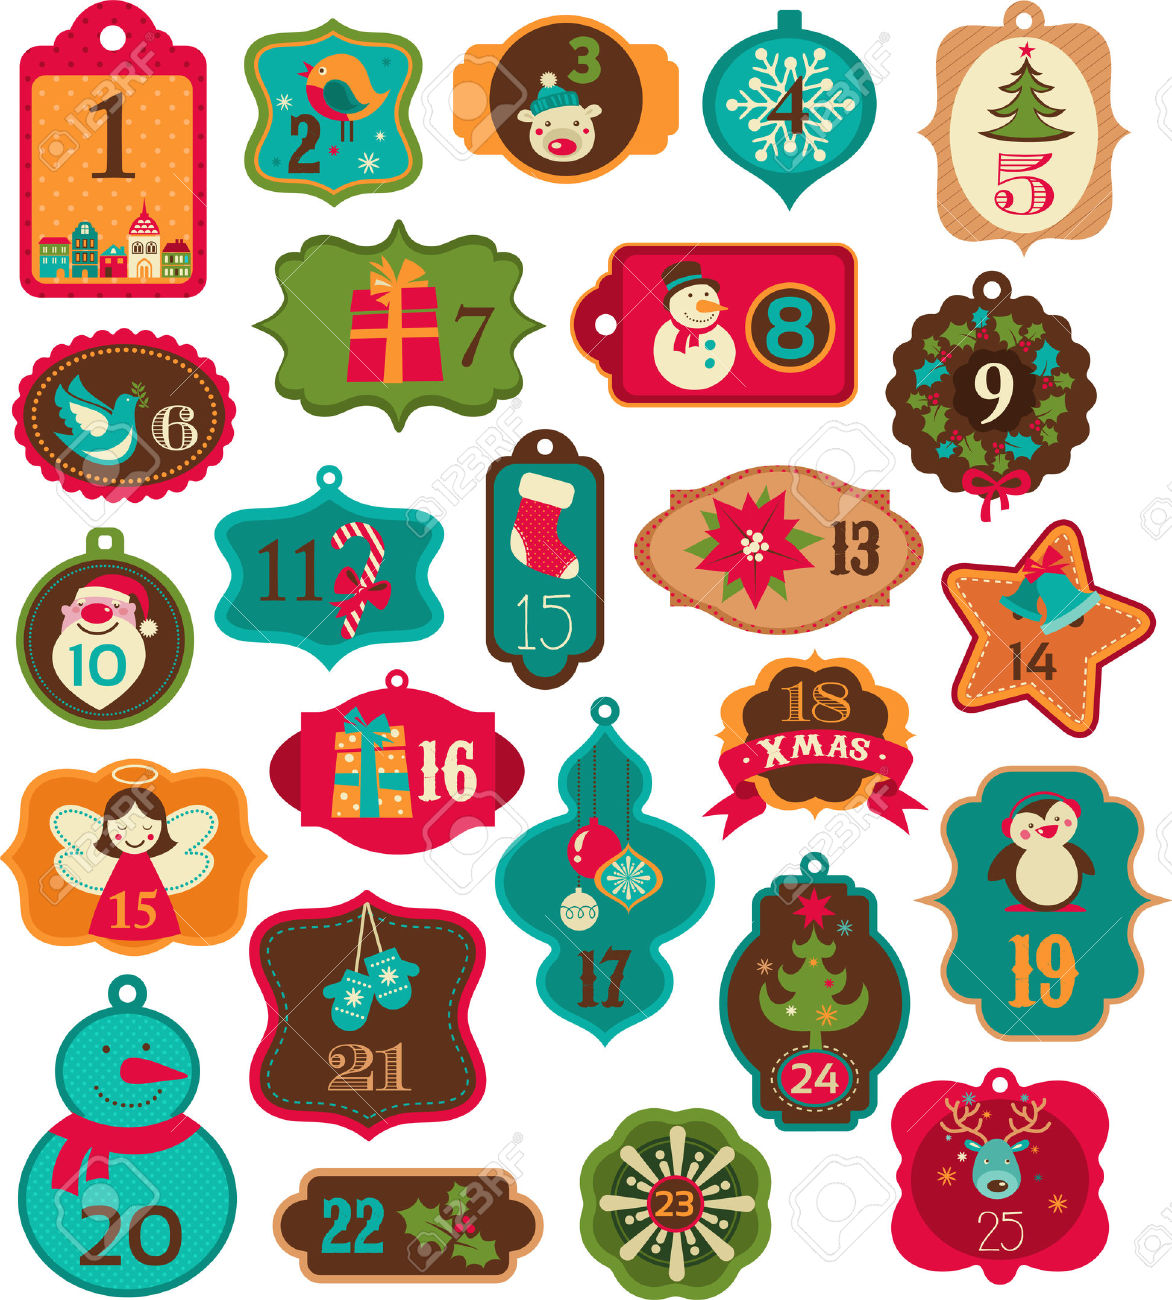 Christmas countdown clipart jpg stock 4,780 Christmas Countdown Stock Illustrations, Cliparts And ... jpg stock